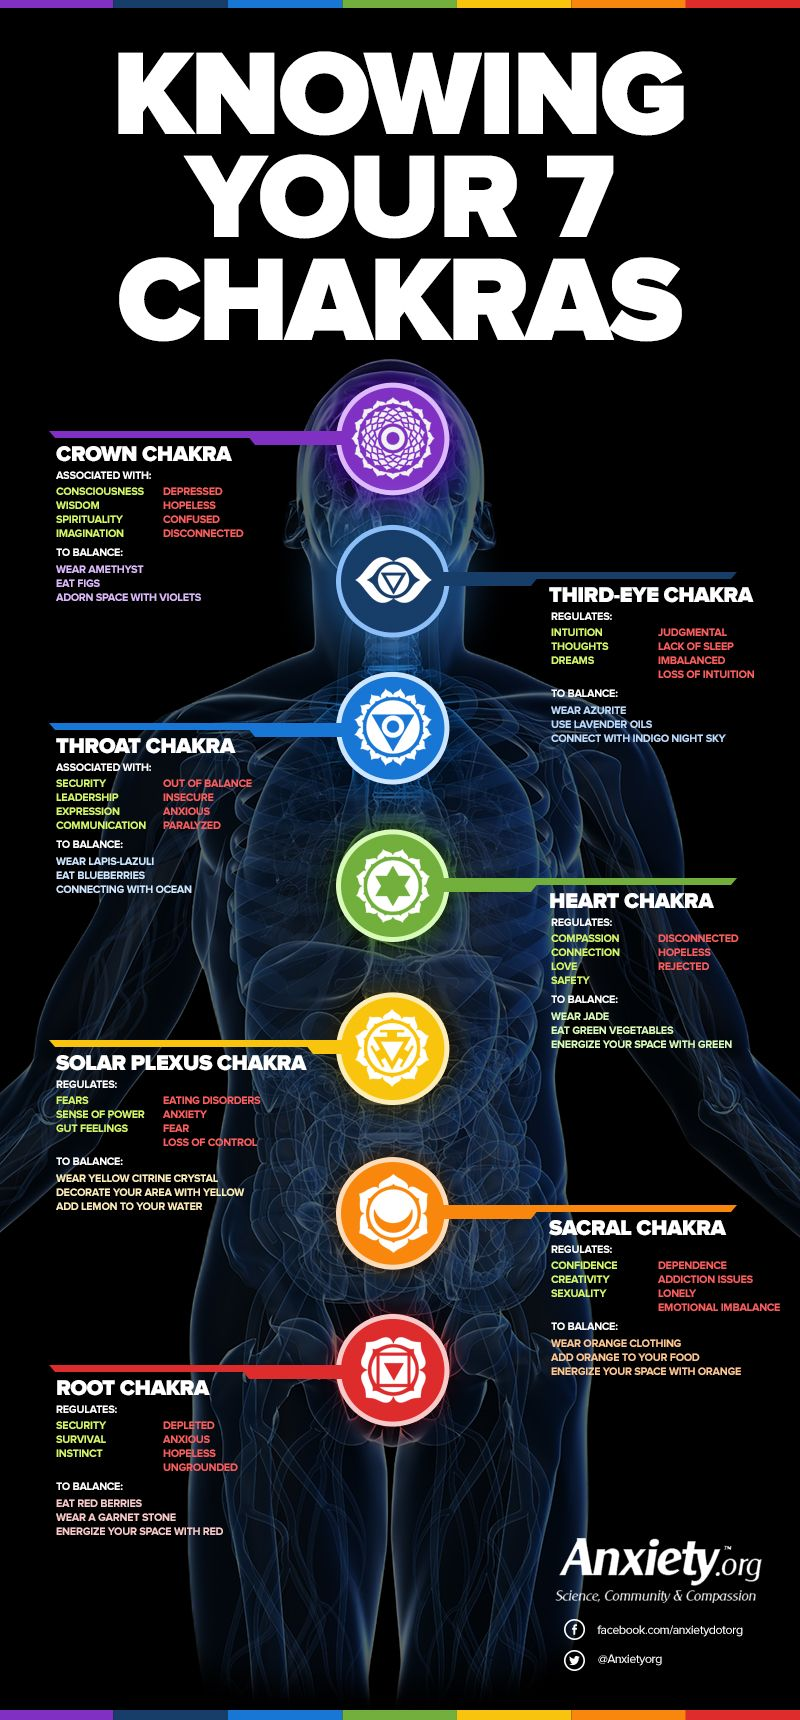 The Chakras With The Tarot Keys: Knowing The 7 Chakras #health #HealthyChoice